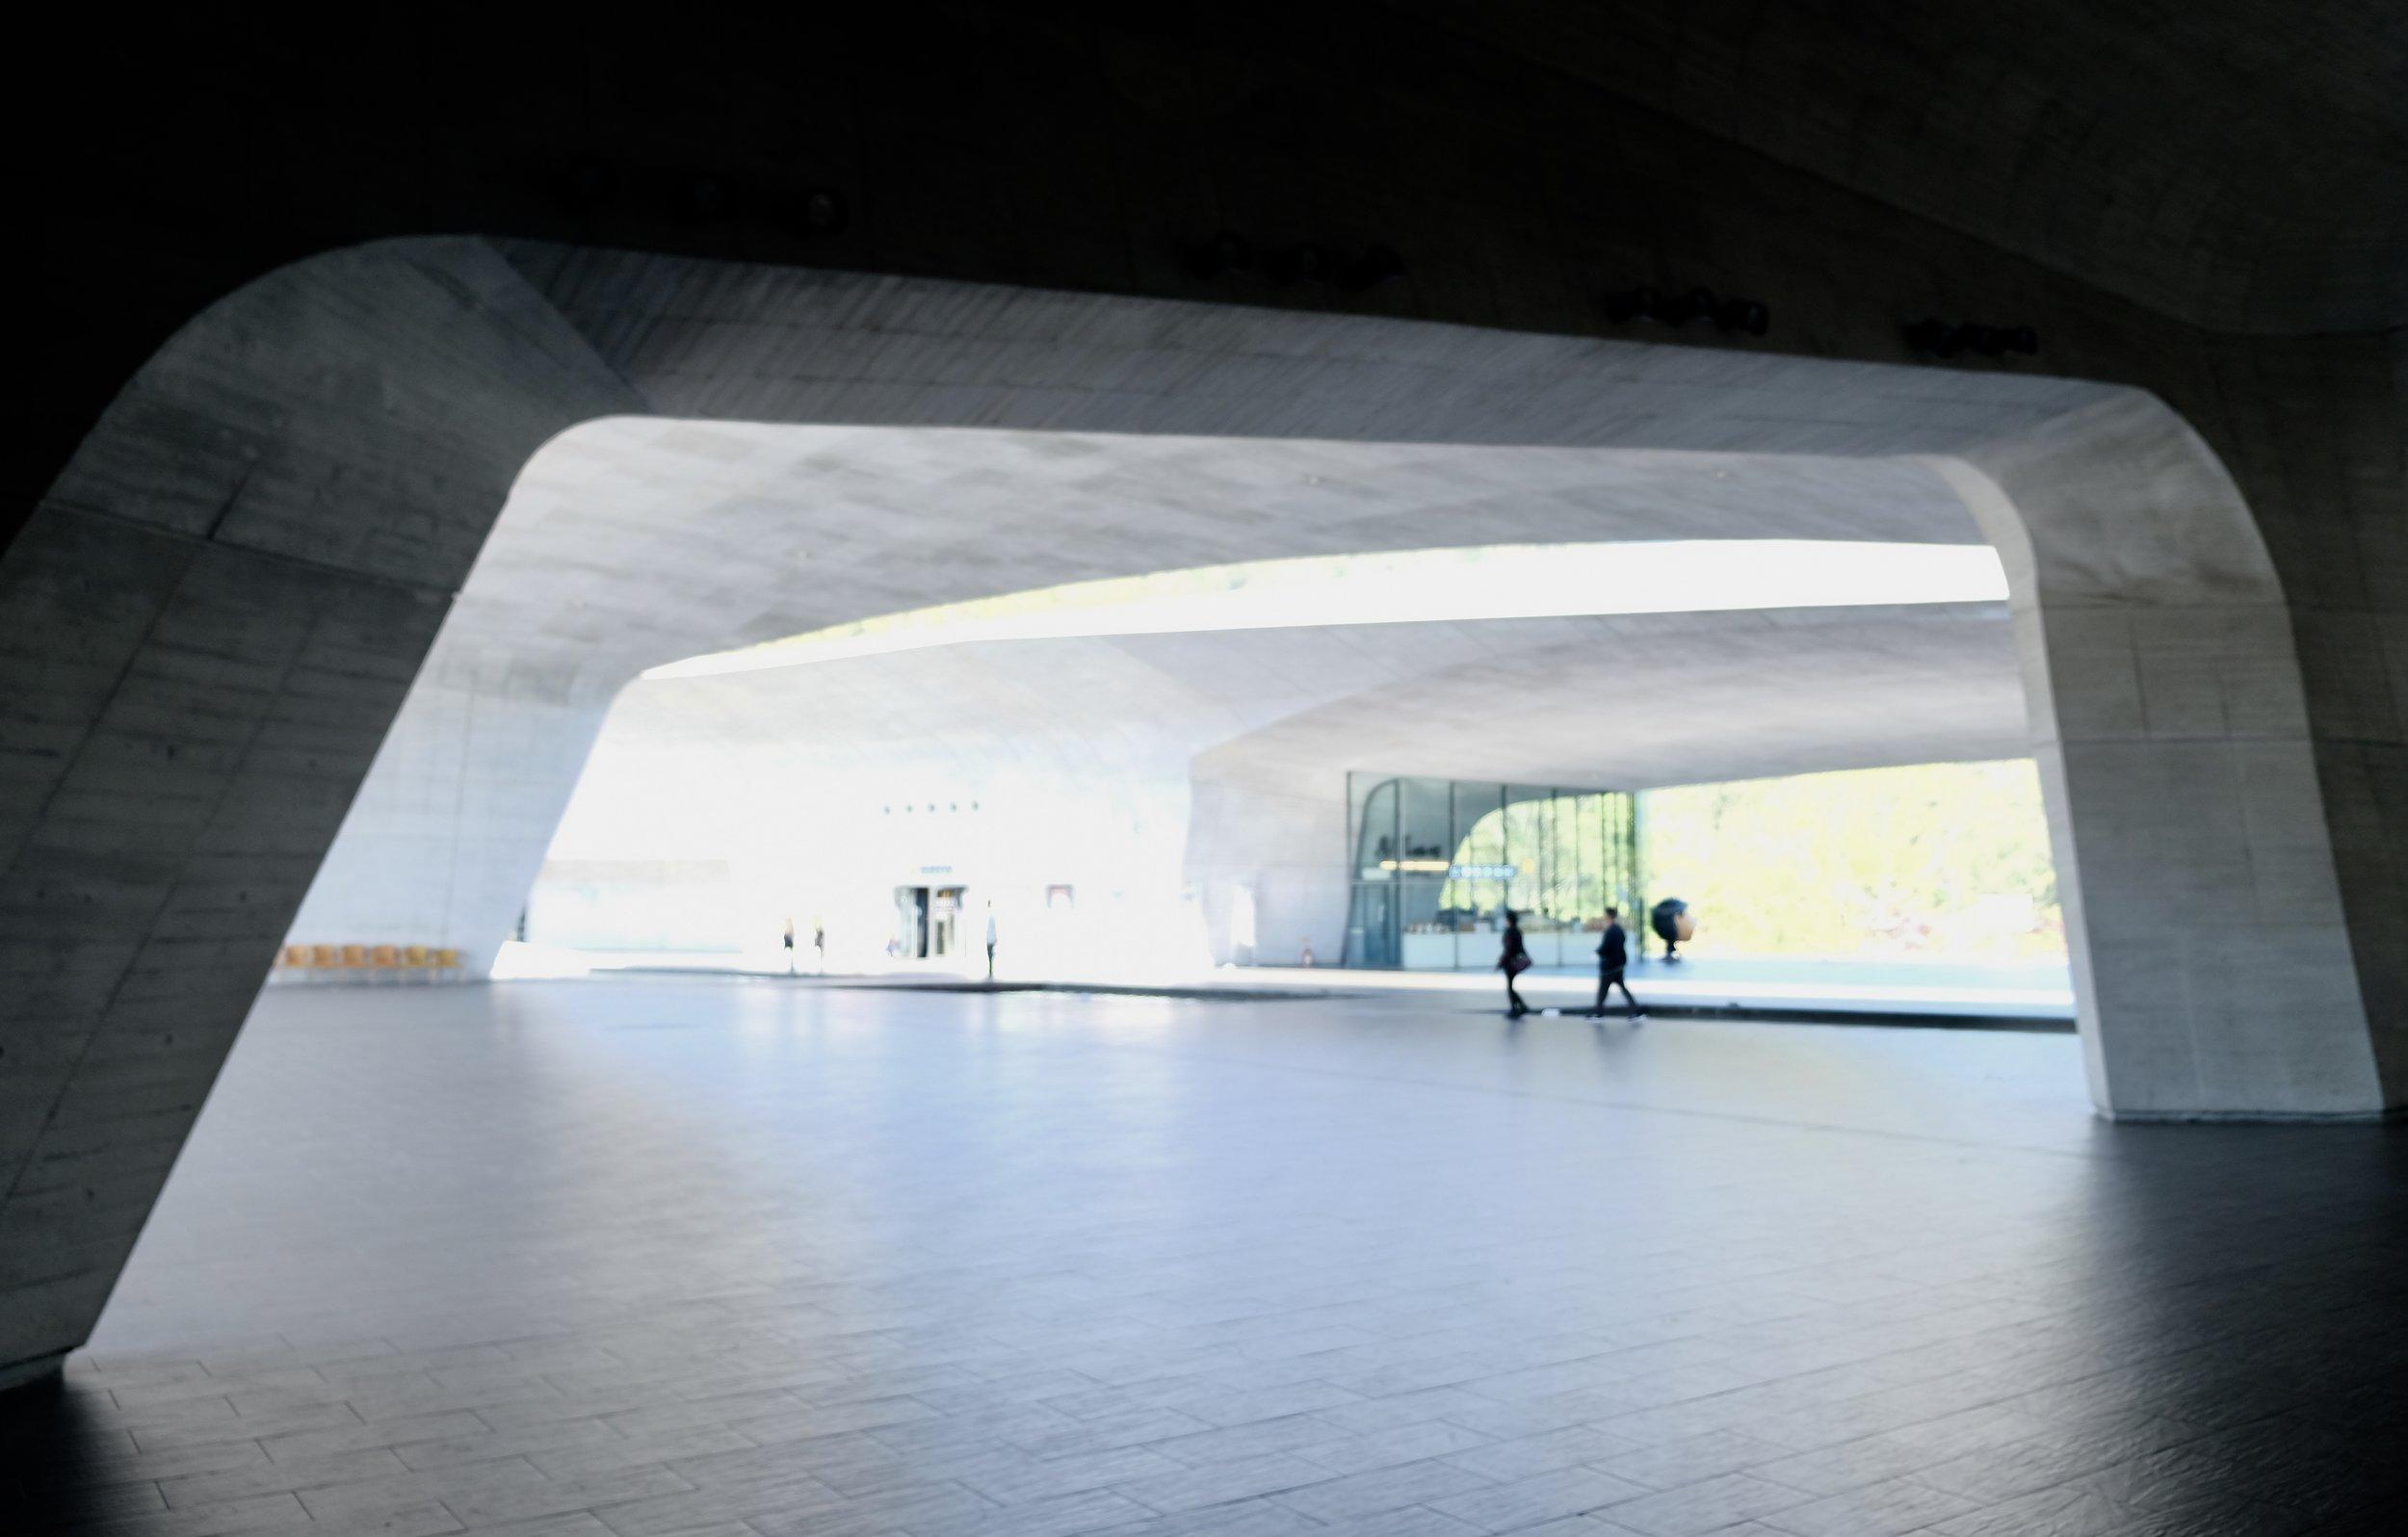 My favourite building - Xiang Shan Visitor Centre by Norihiko Dan & Associates